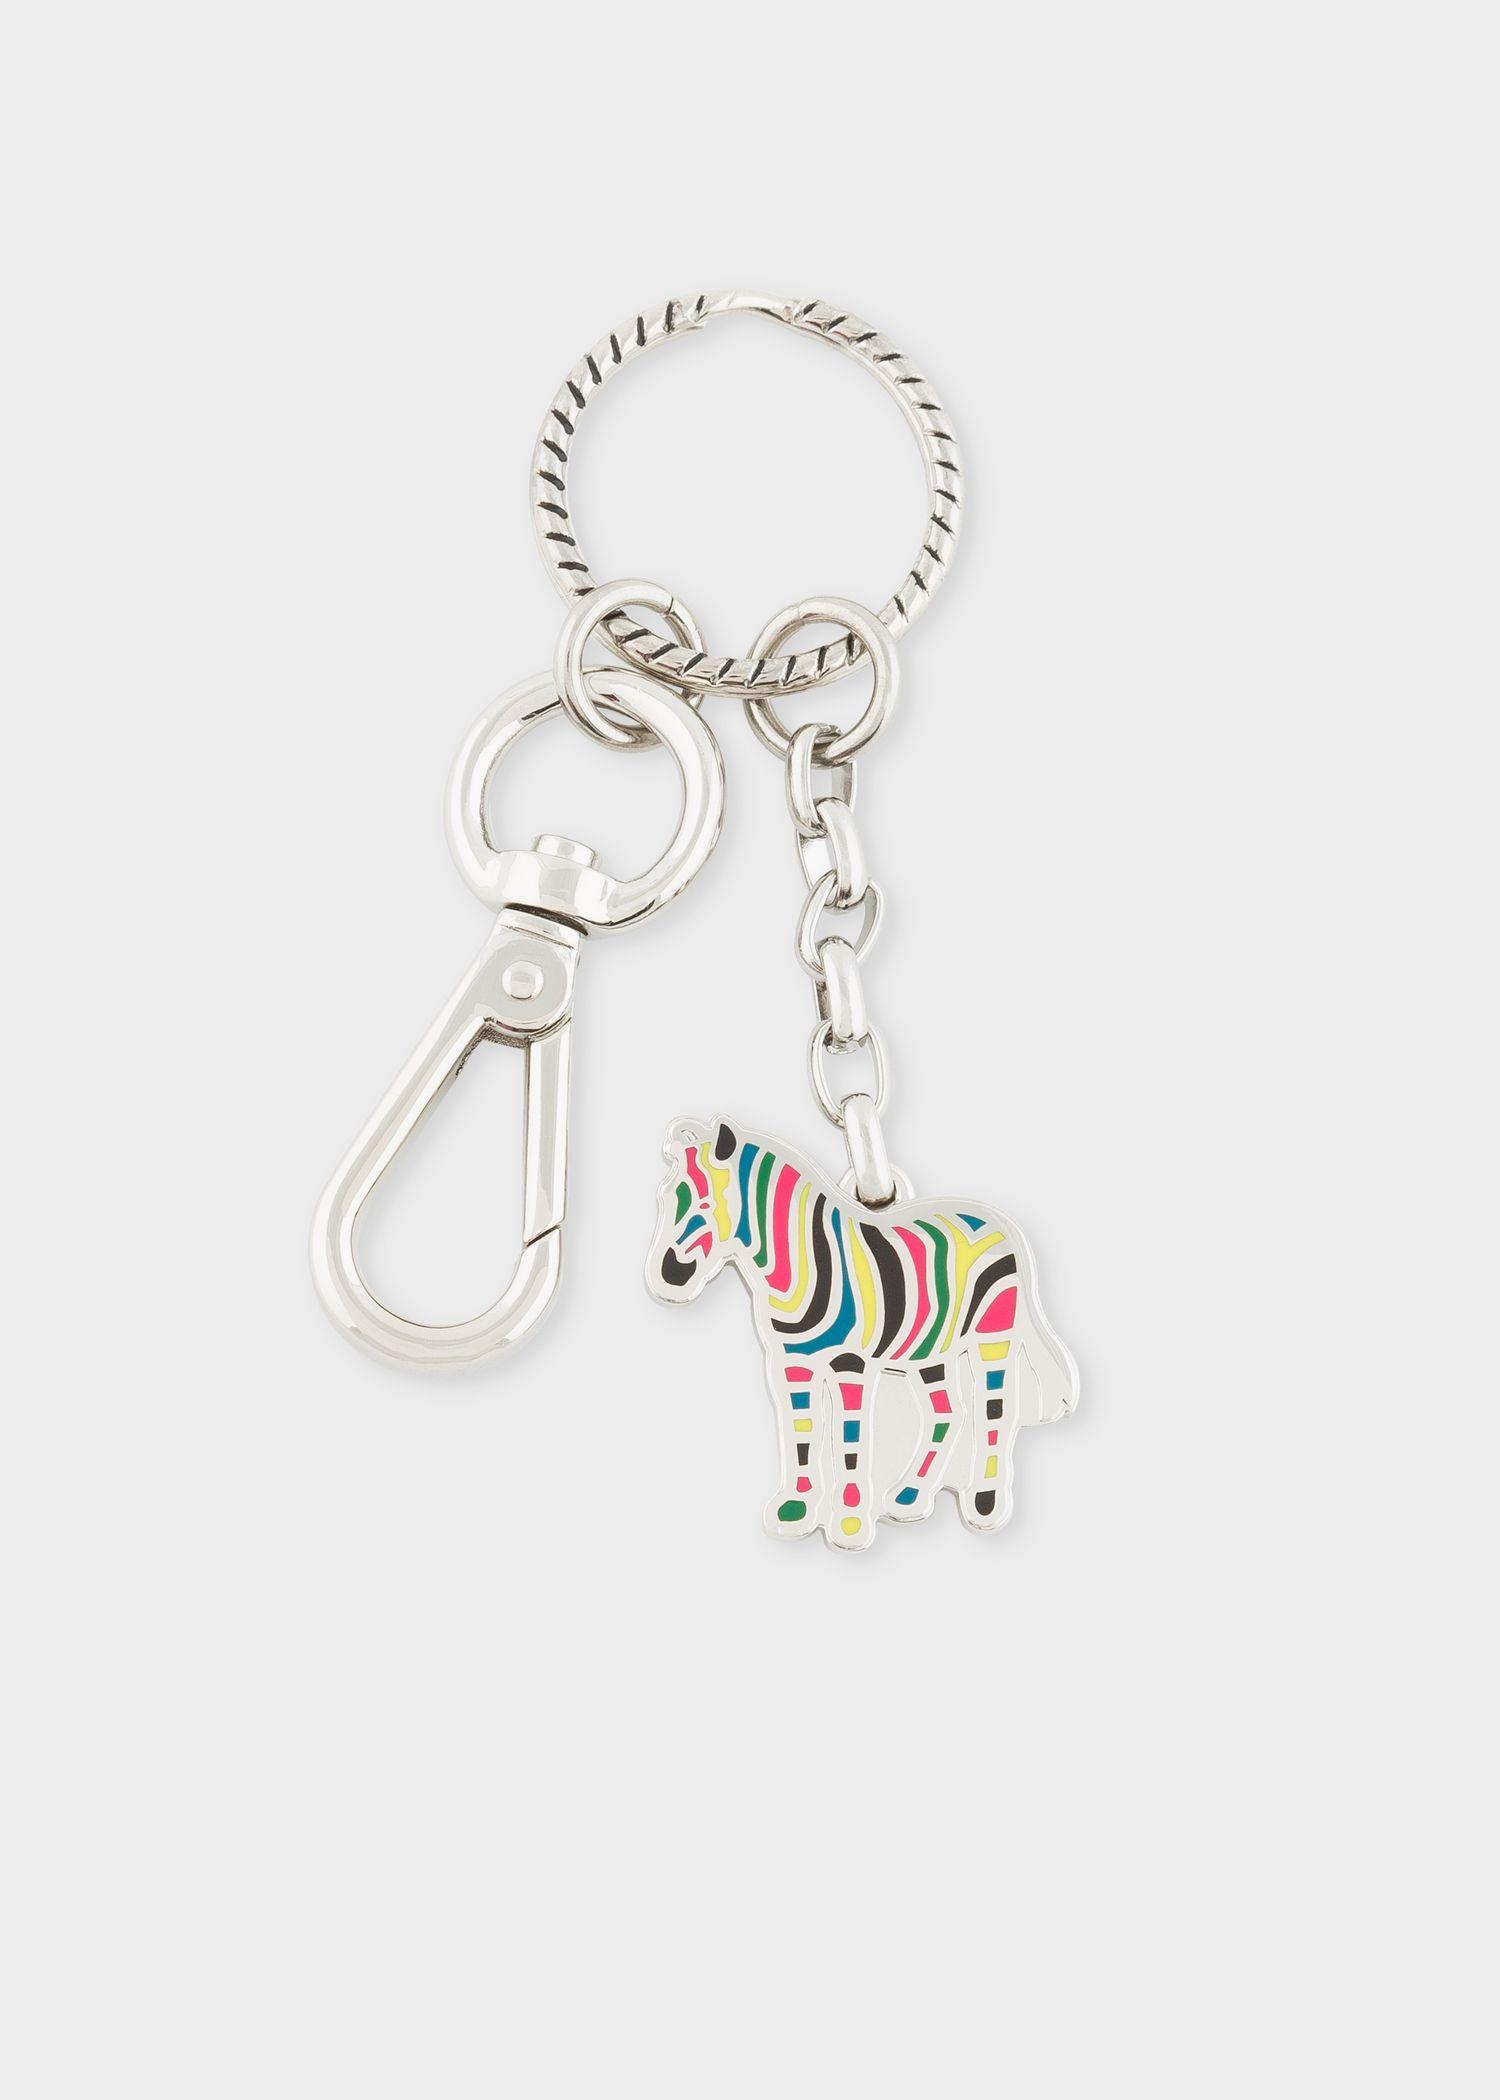 NEW Paul Smith Metal Zebra Keyring Key Chain $95 FREE Shipping